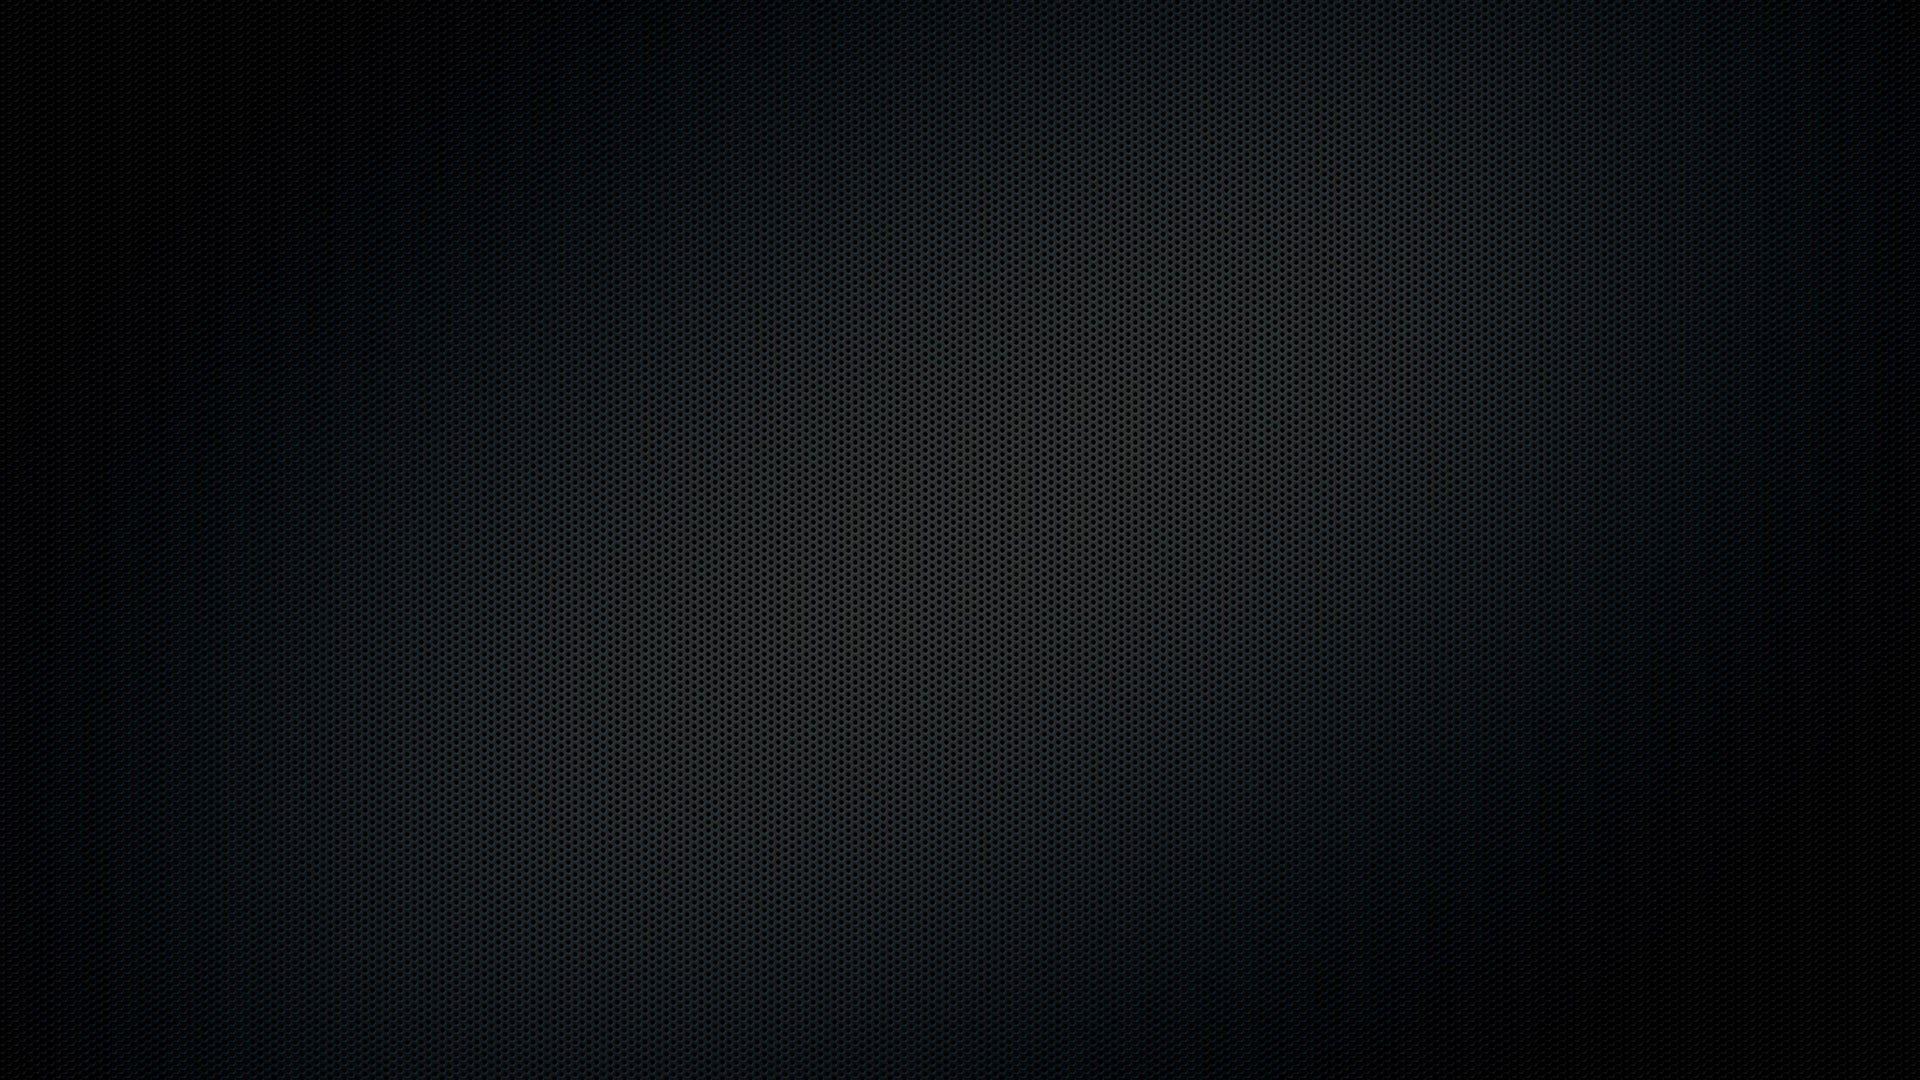 Dark Abstract Wallpaper 71 Images